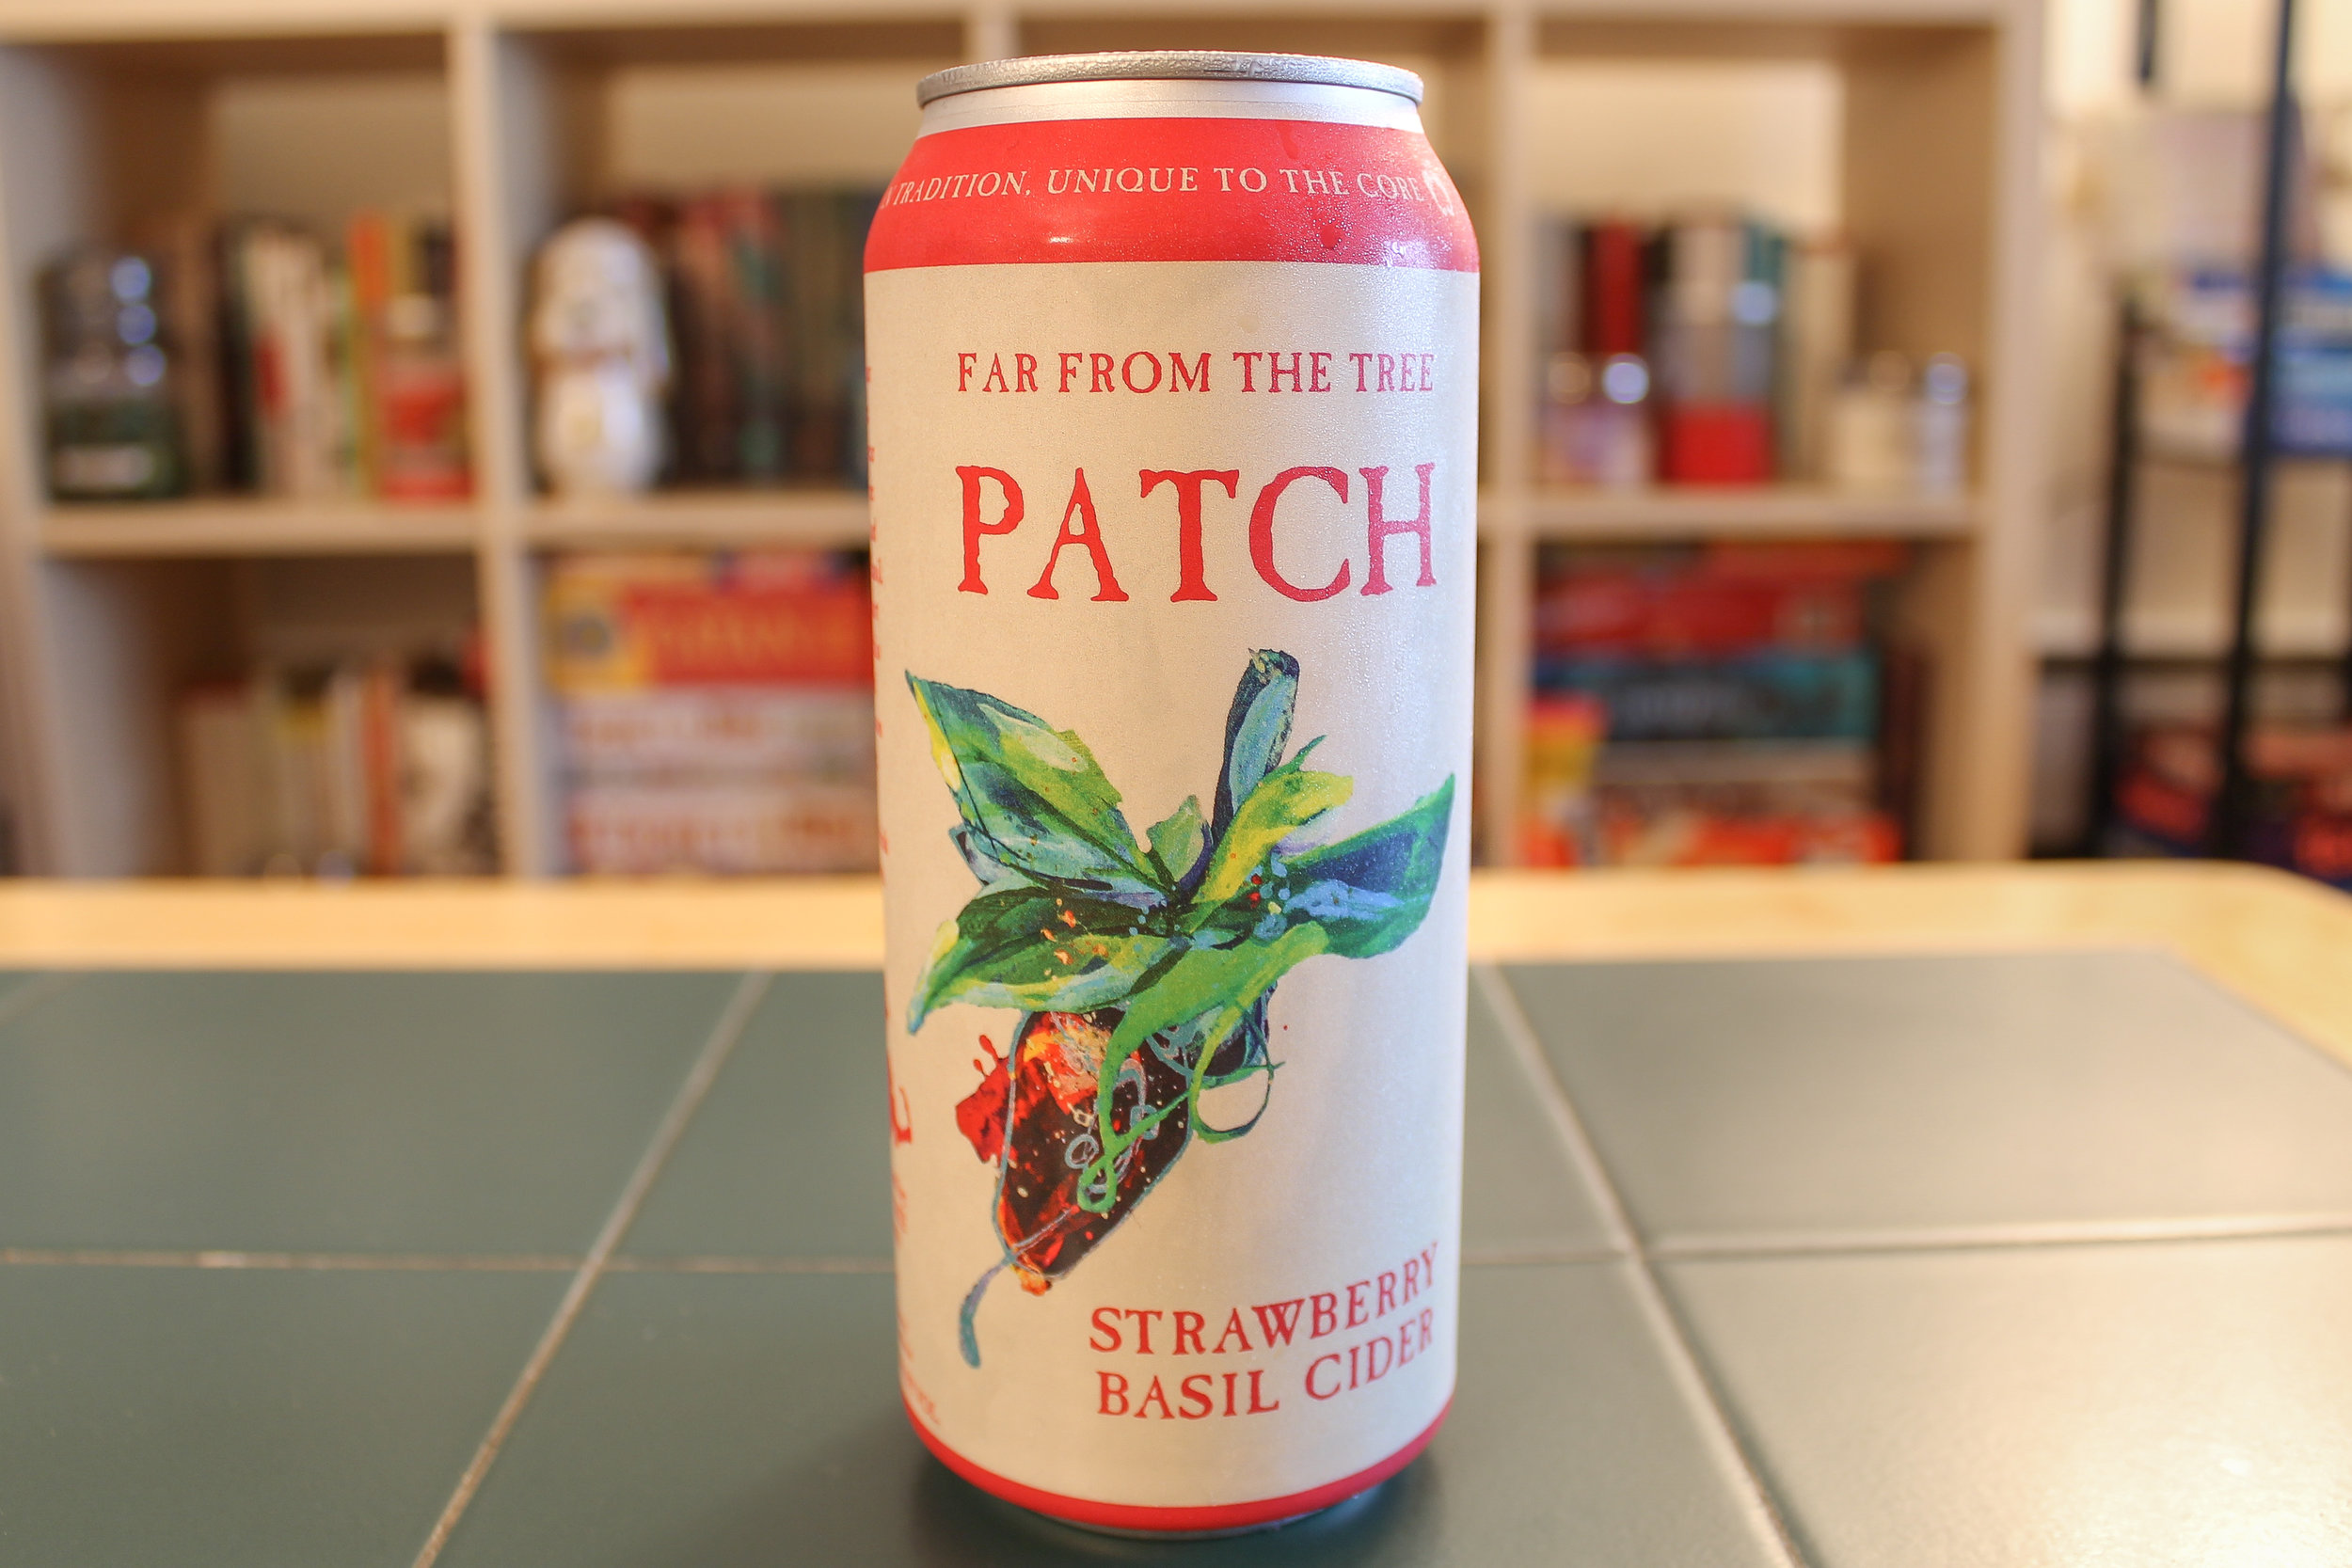 Patch cider